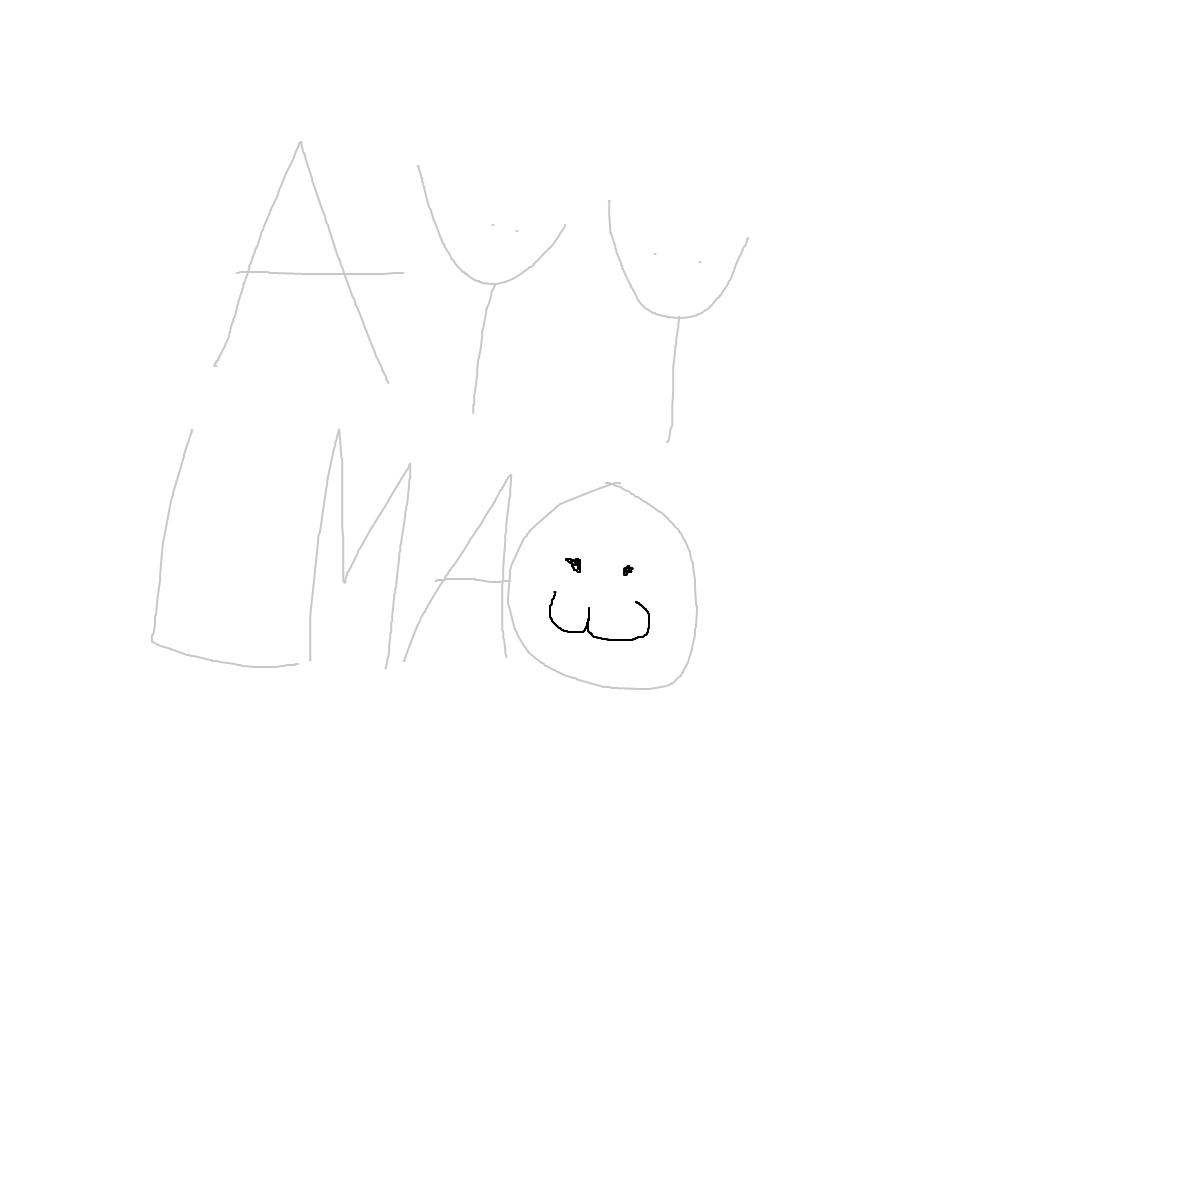 BAAAM drawing#8144 lat:47.2857818603515600lng: 8.6277236938476560